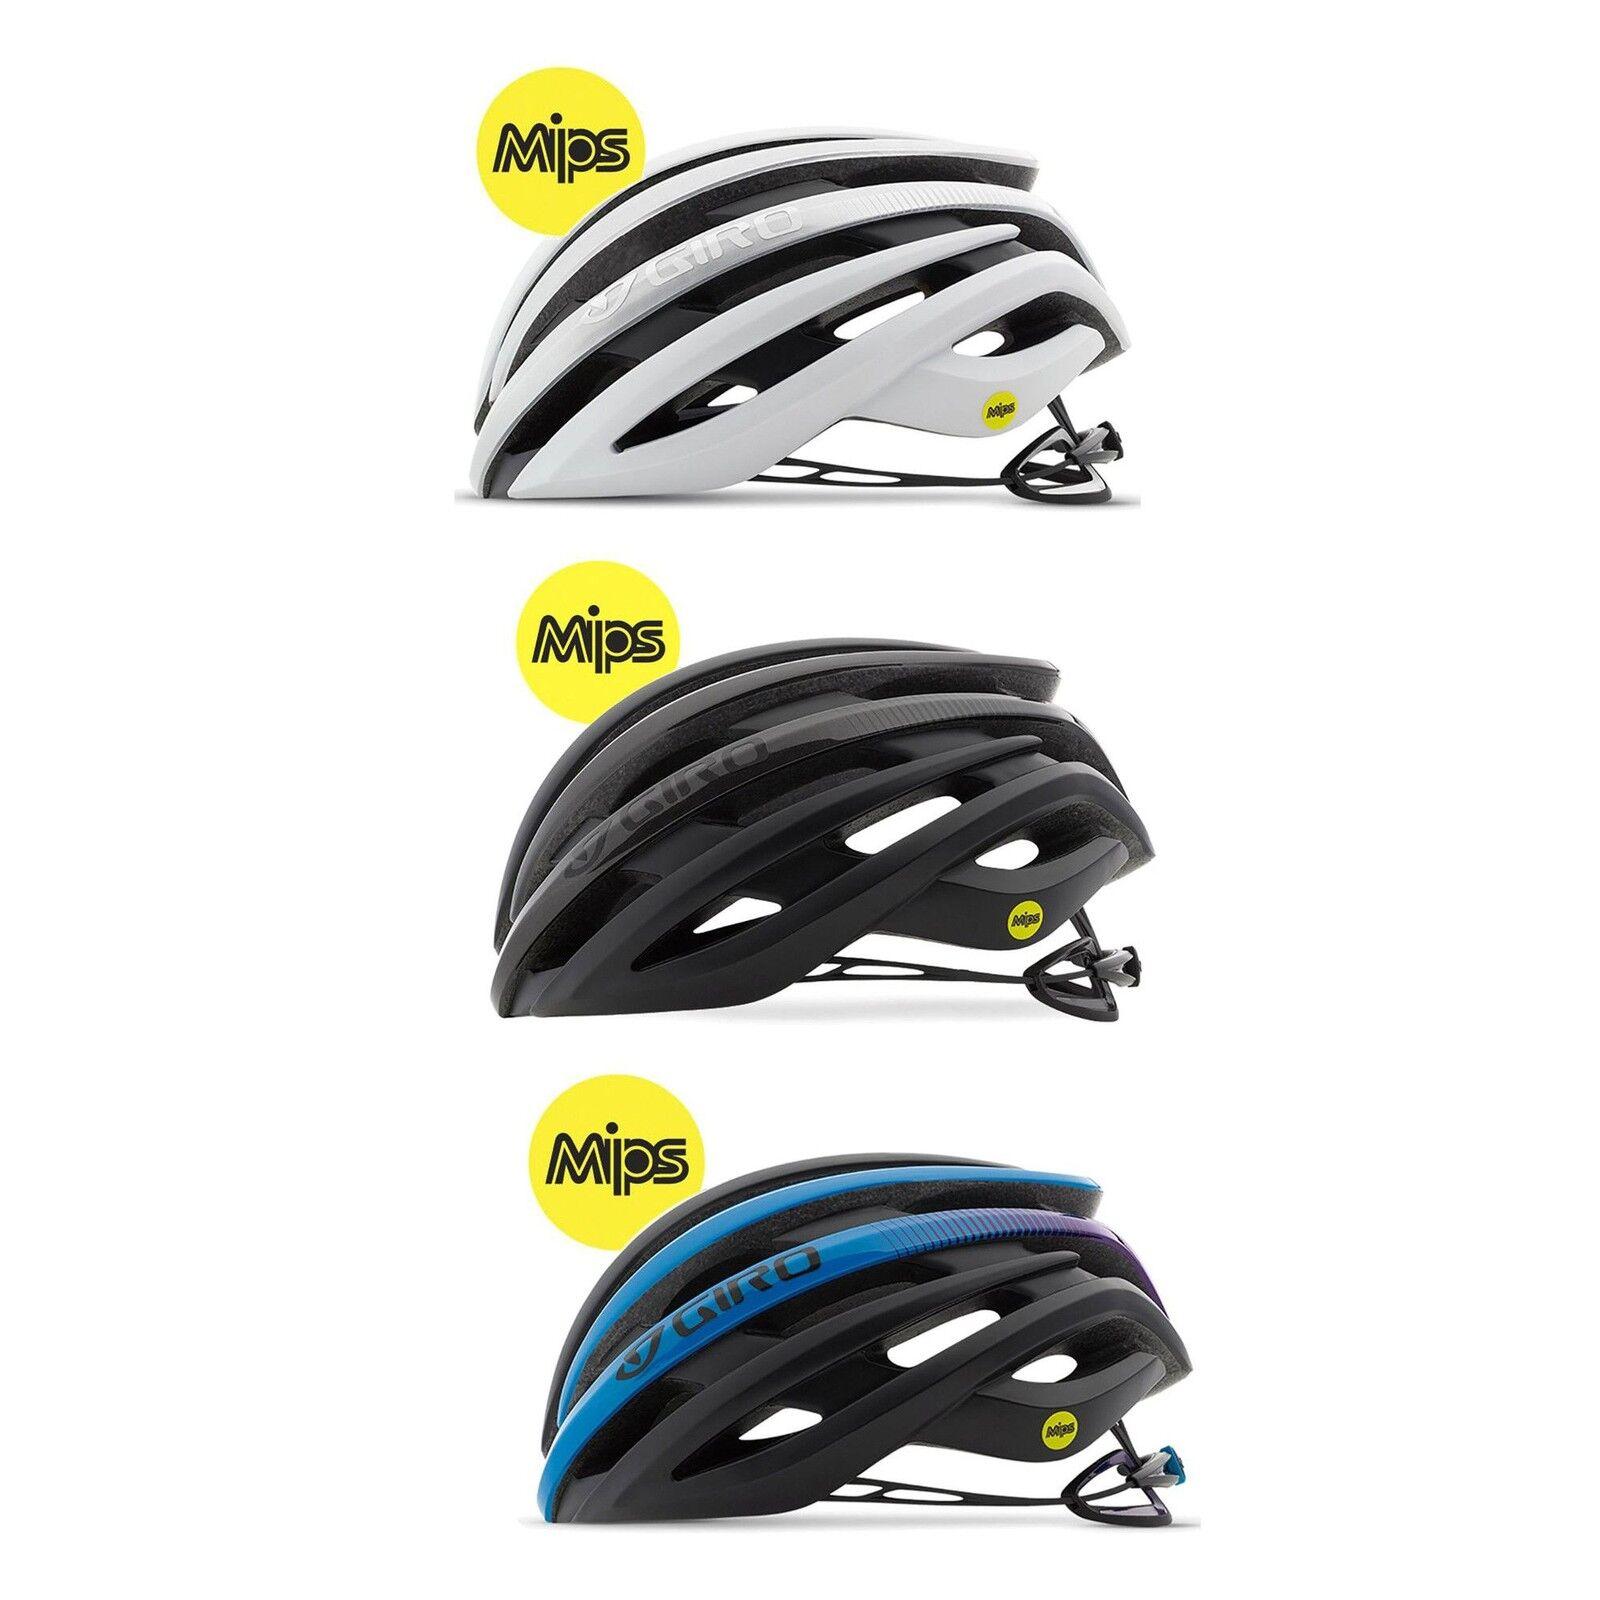 Giro Cinder MIPS Road Racer Bike Cycling Cycle Biking Crash Helmet Lid